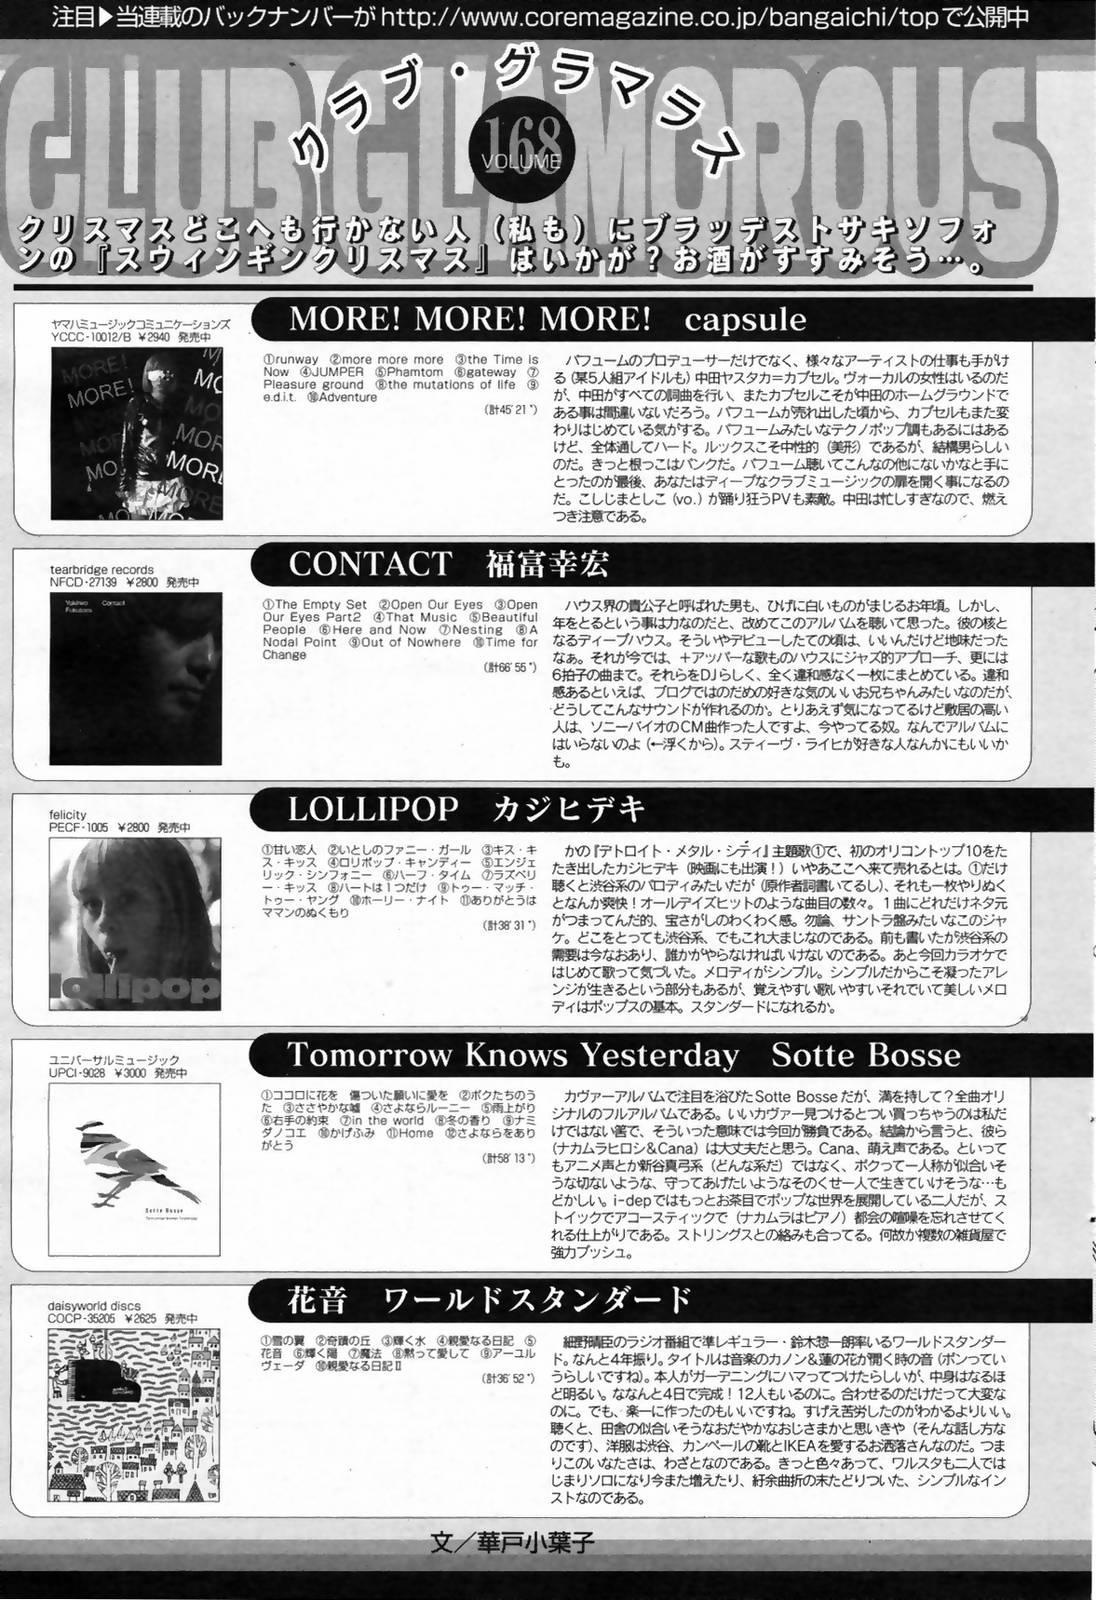 Manga Bangaichi 2009-02 Vol. 234 78